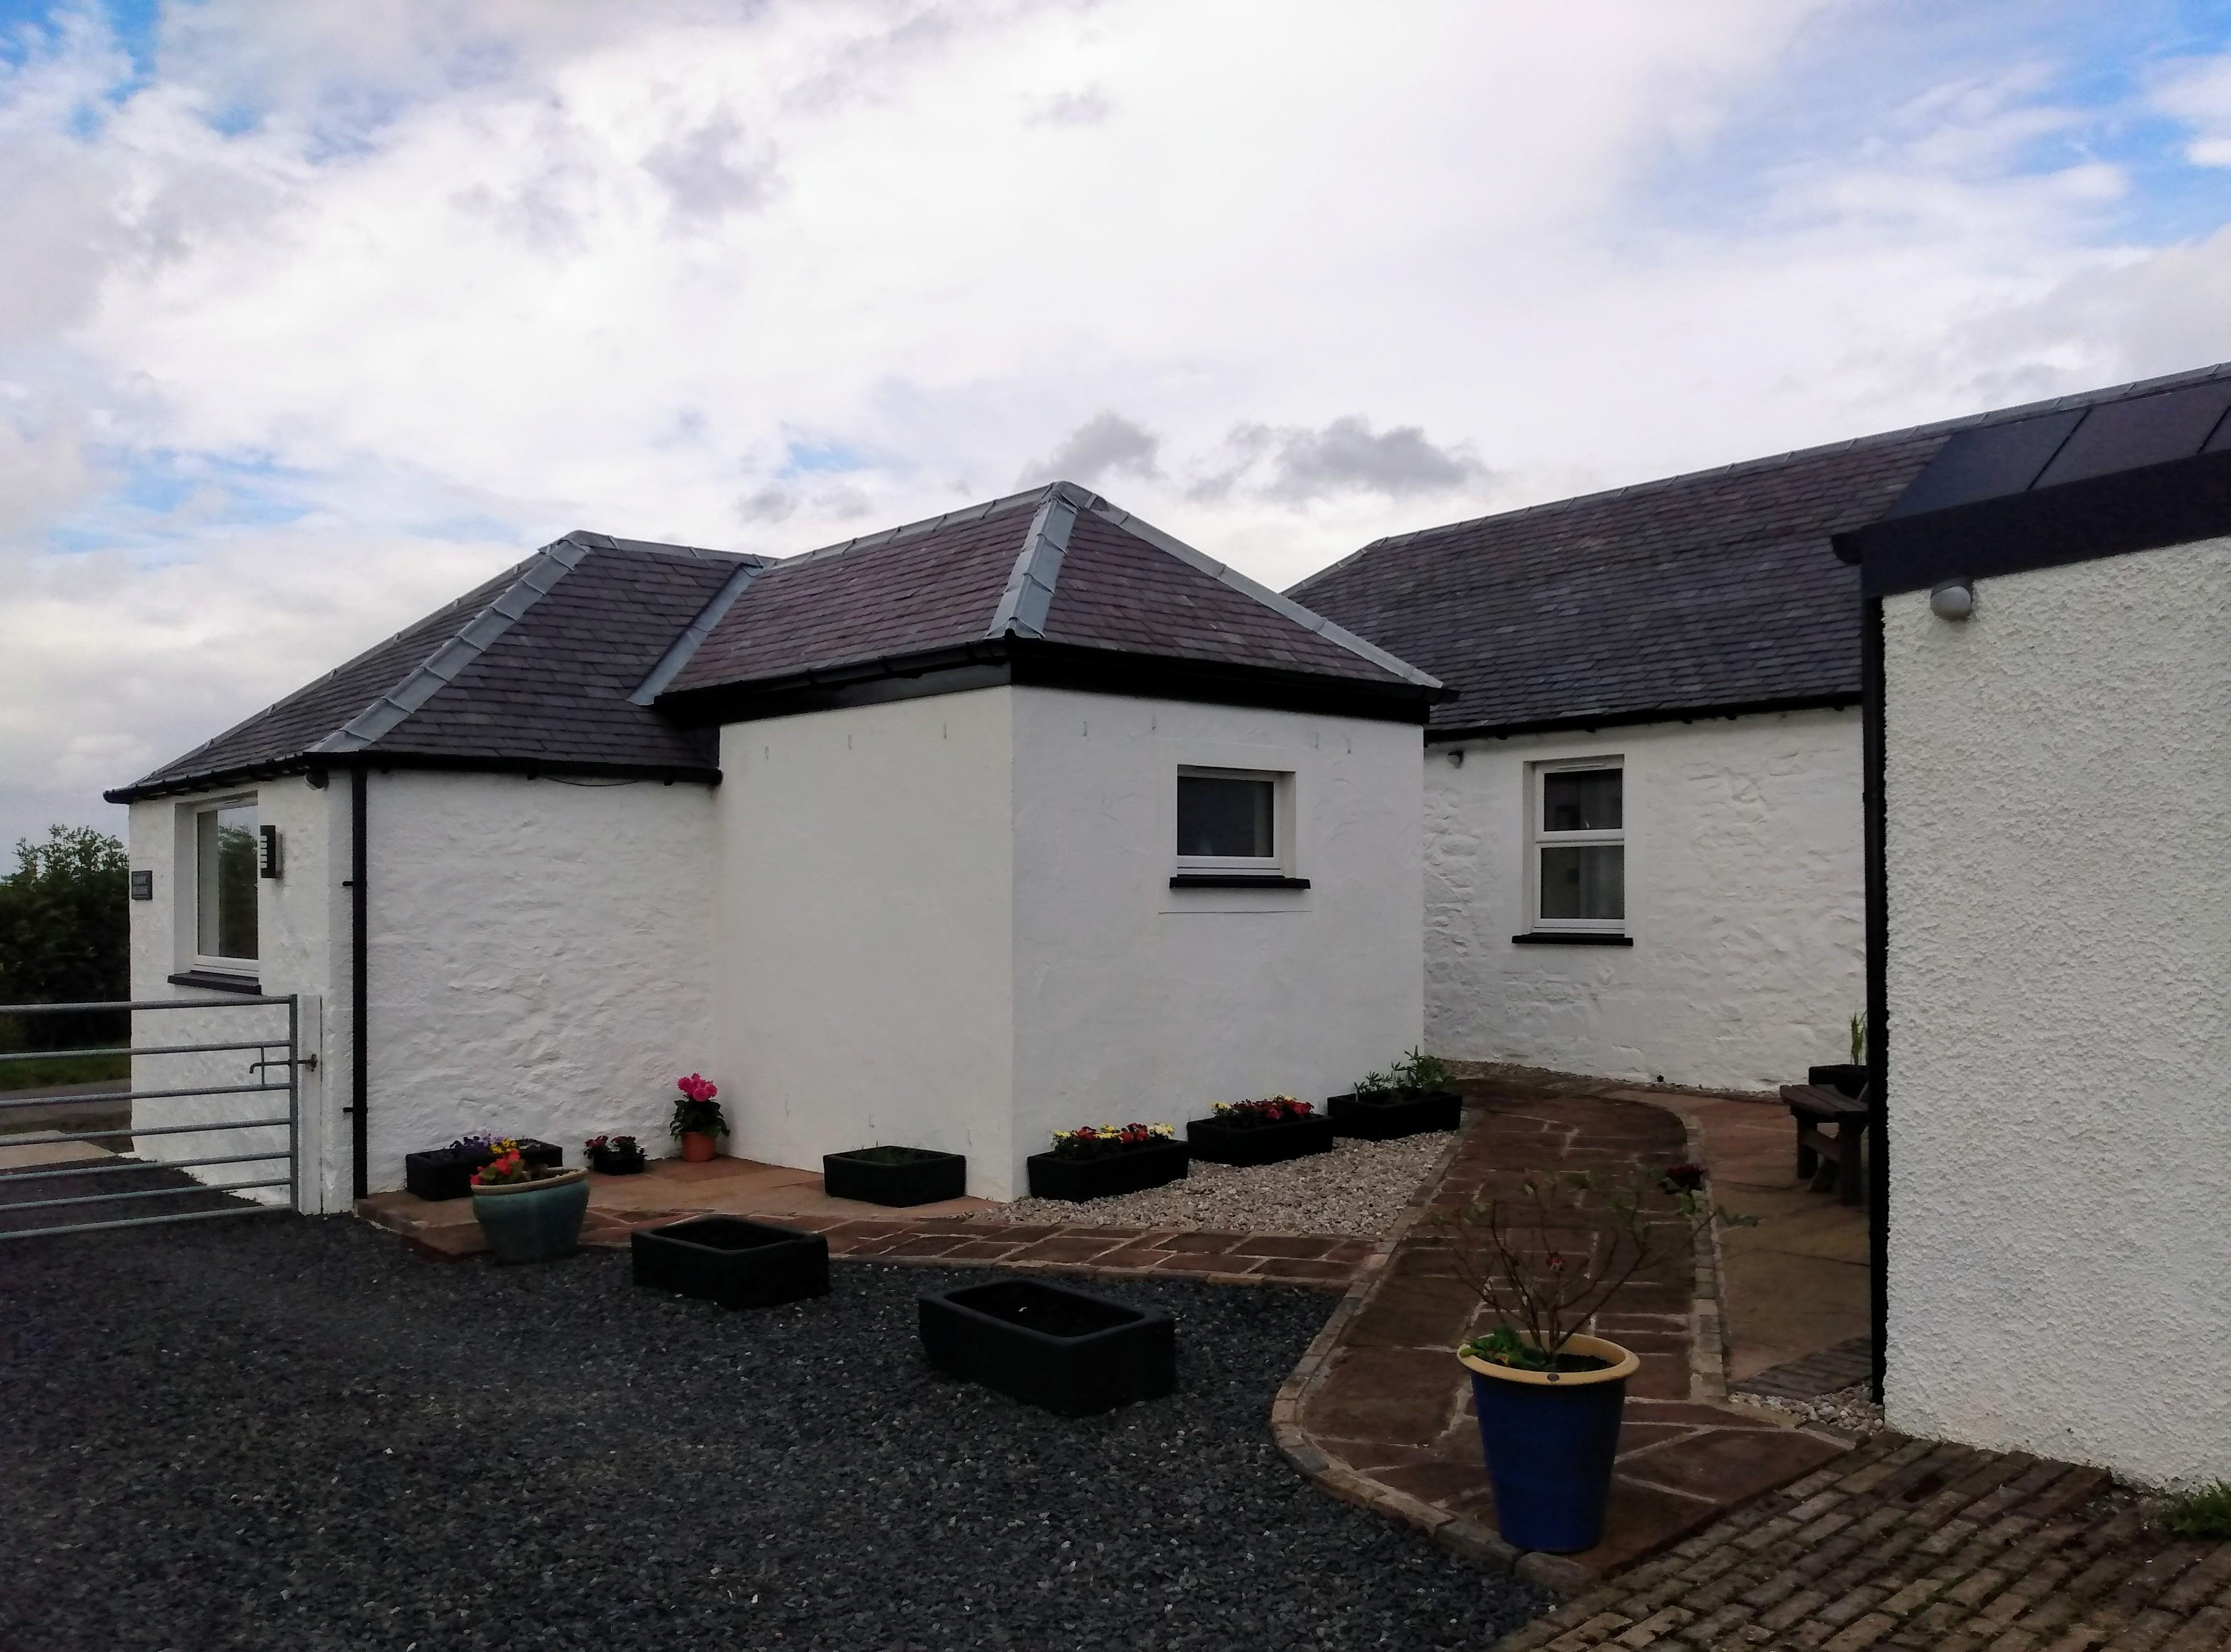 Darnhay Milkhouse1